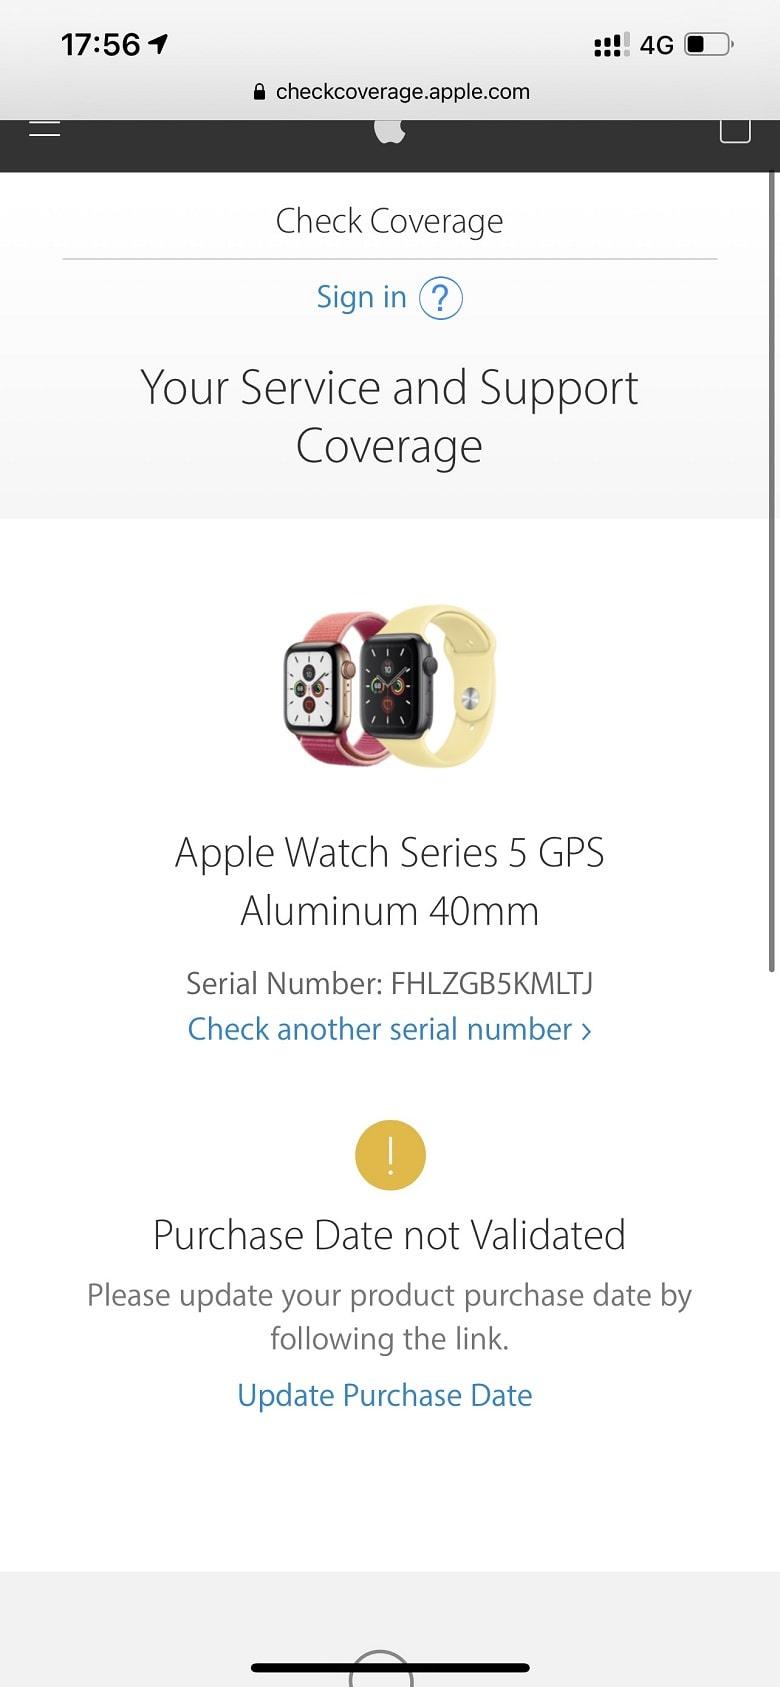 kiểm tra Apple Watch Series 5 (40mm)